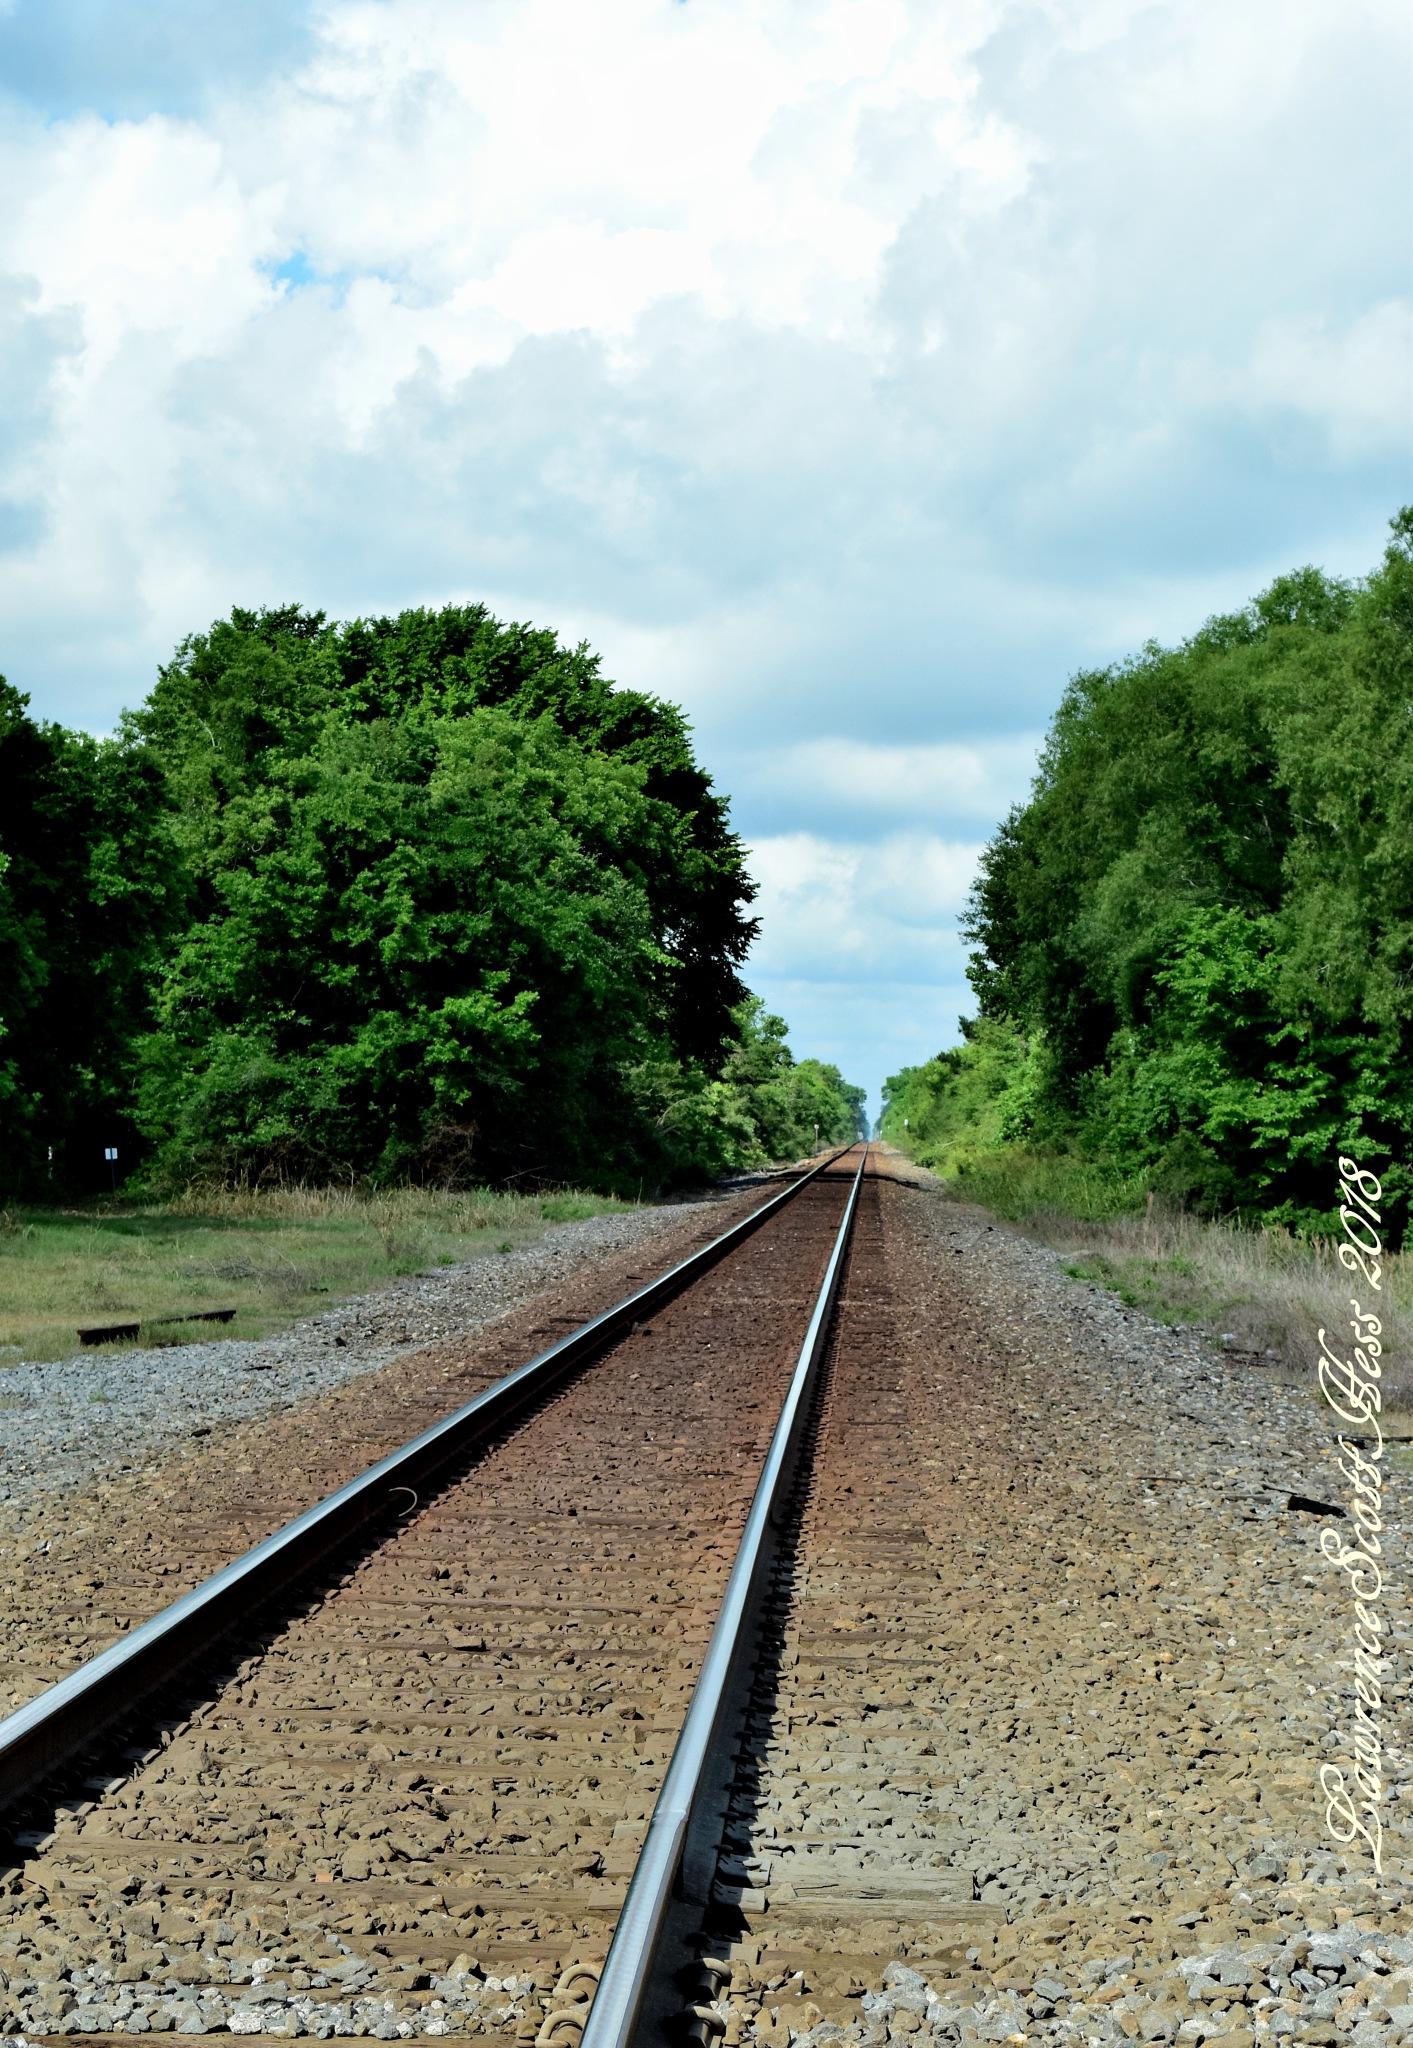 Scotty's Art 1351~The Railroad Tracks by Lawrence Scott Hess